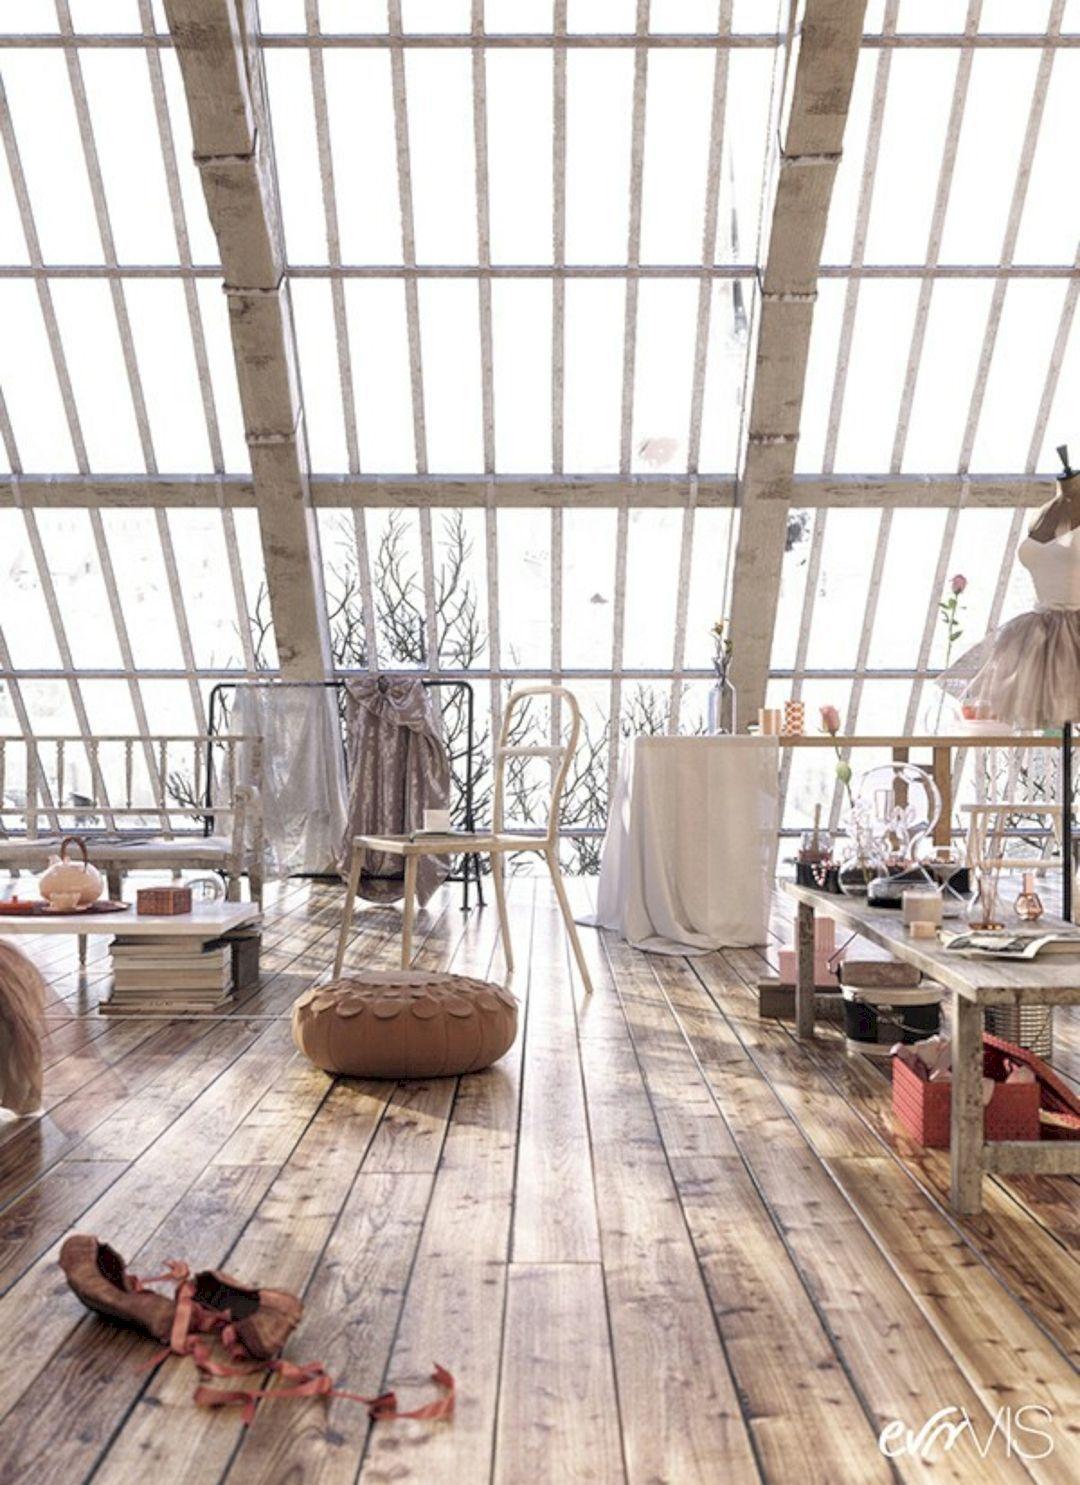 Merveilleux 92 Beautiful Modern Apartment Interior Ideas  Https://www.futuristarchitecture.com/22343 Modern Apartment Interior Ideas. Html